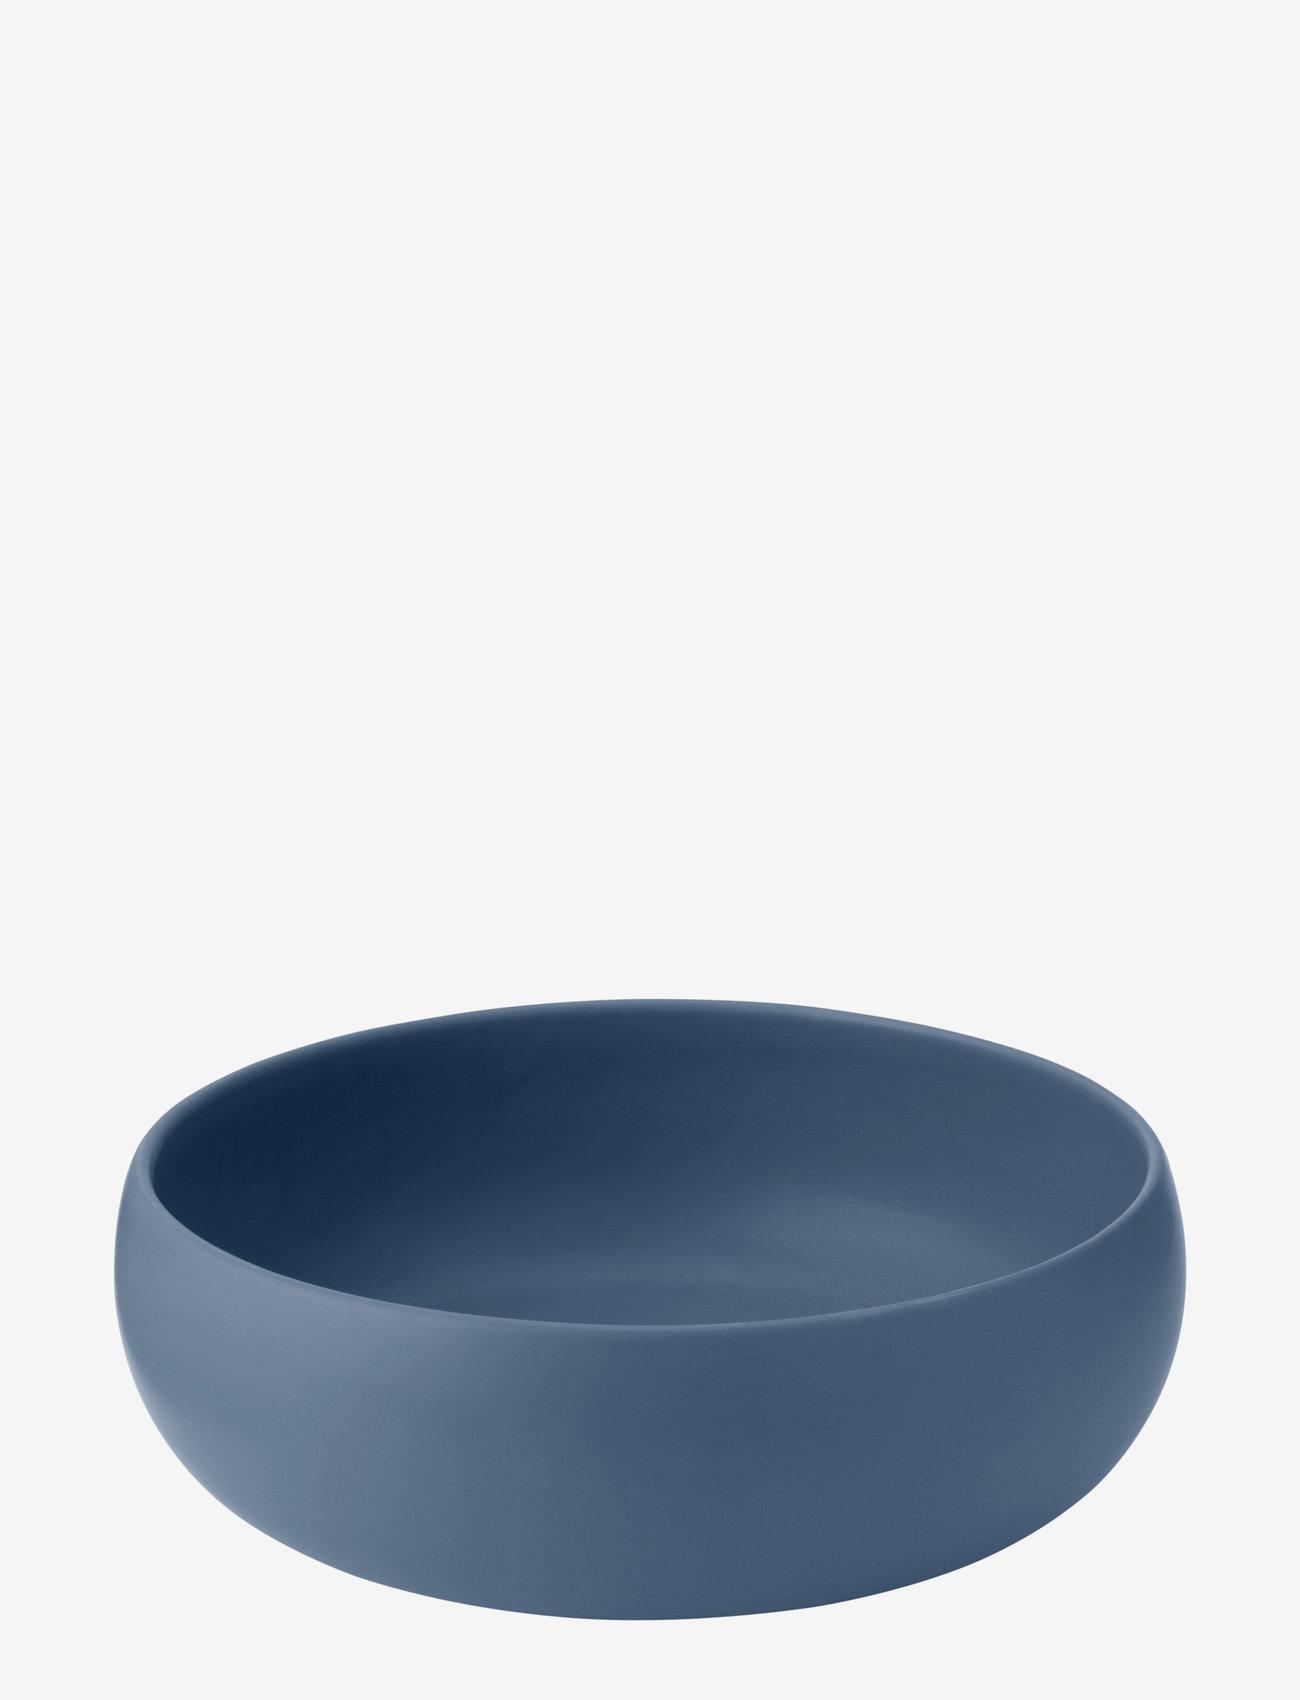 Knabstrup Keramik - Earth skål - salatboller - dusty blue - 0